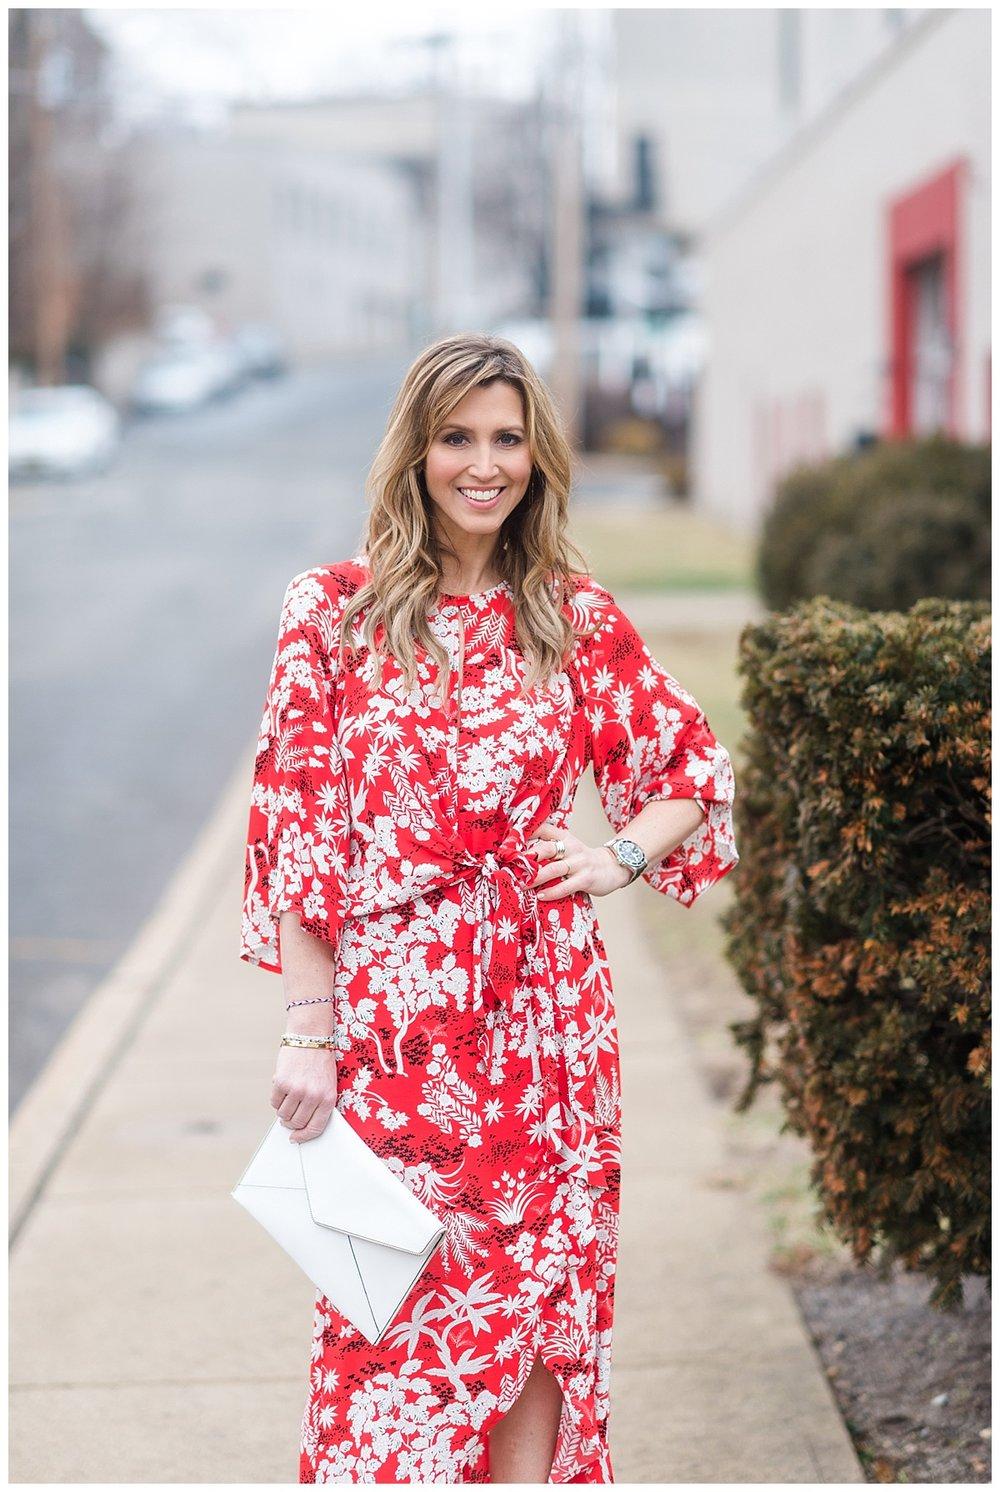 Red floral dress_1111.jpg